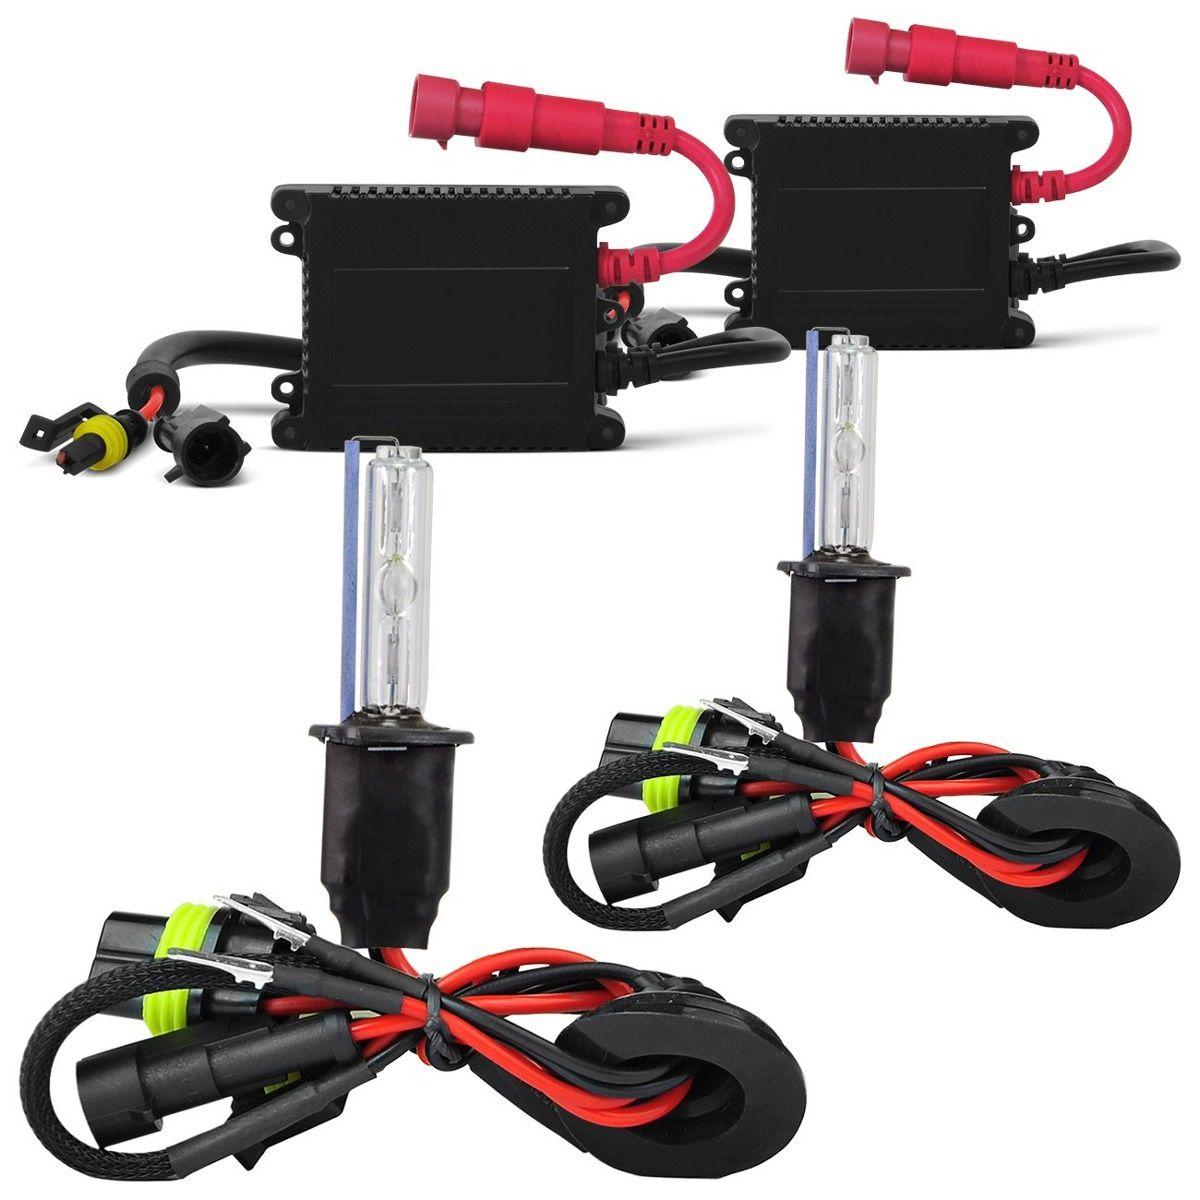 Kit Xenon Carro Tech One 8000k 12v Lampada H1 H3 H4-2 H7 Hb4 H11 - Luz Branco Azulado Visual HID